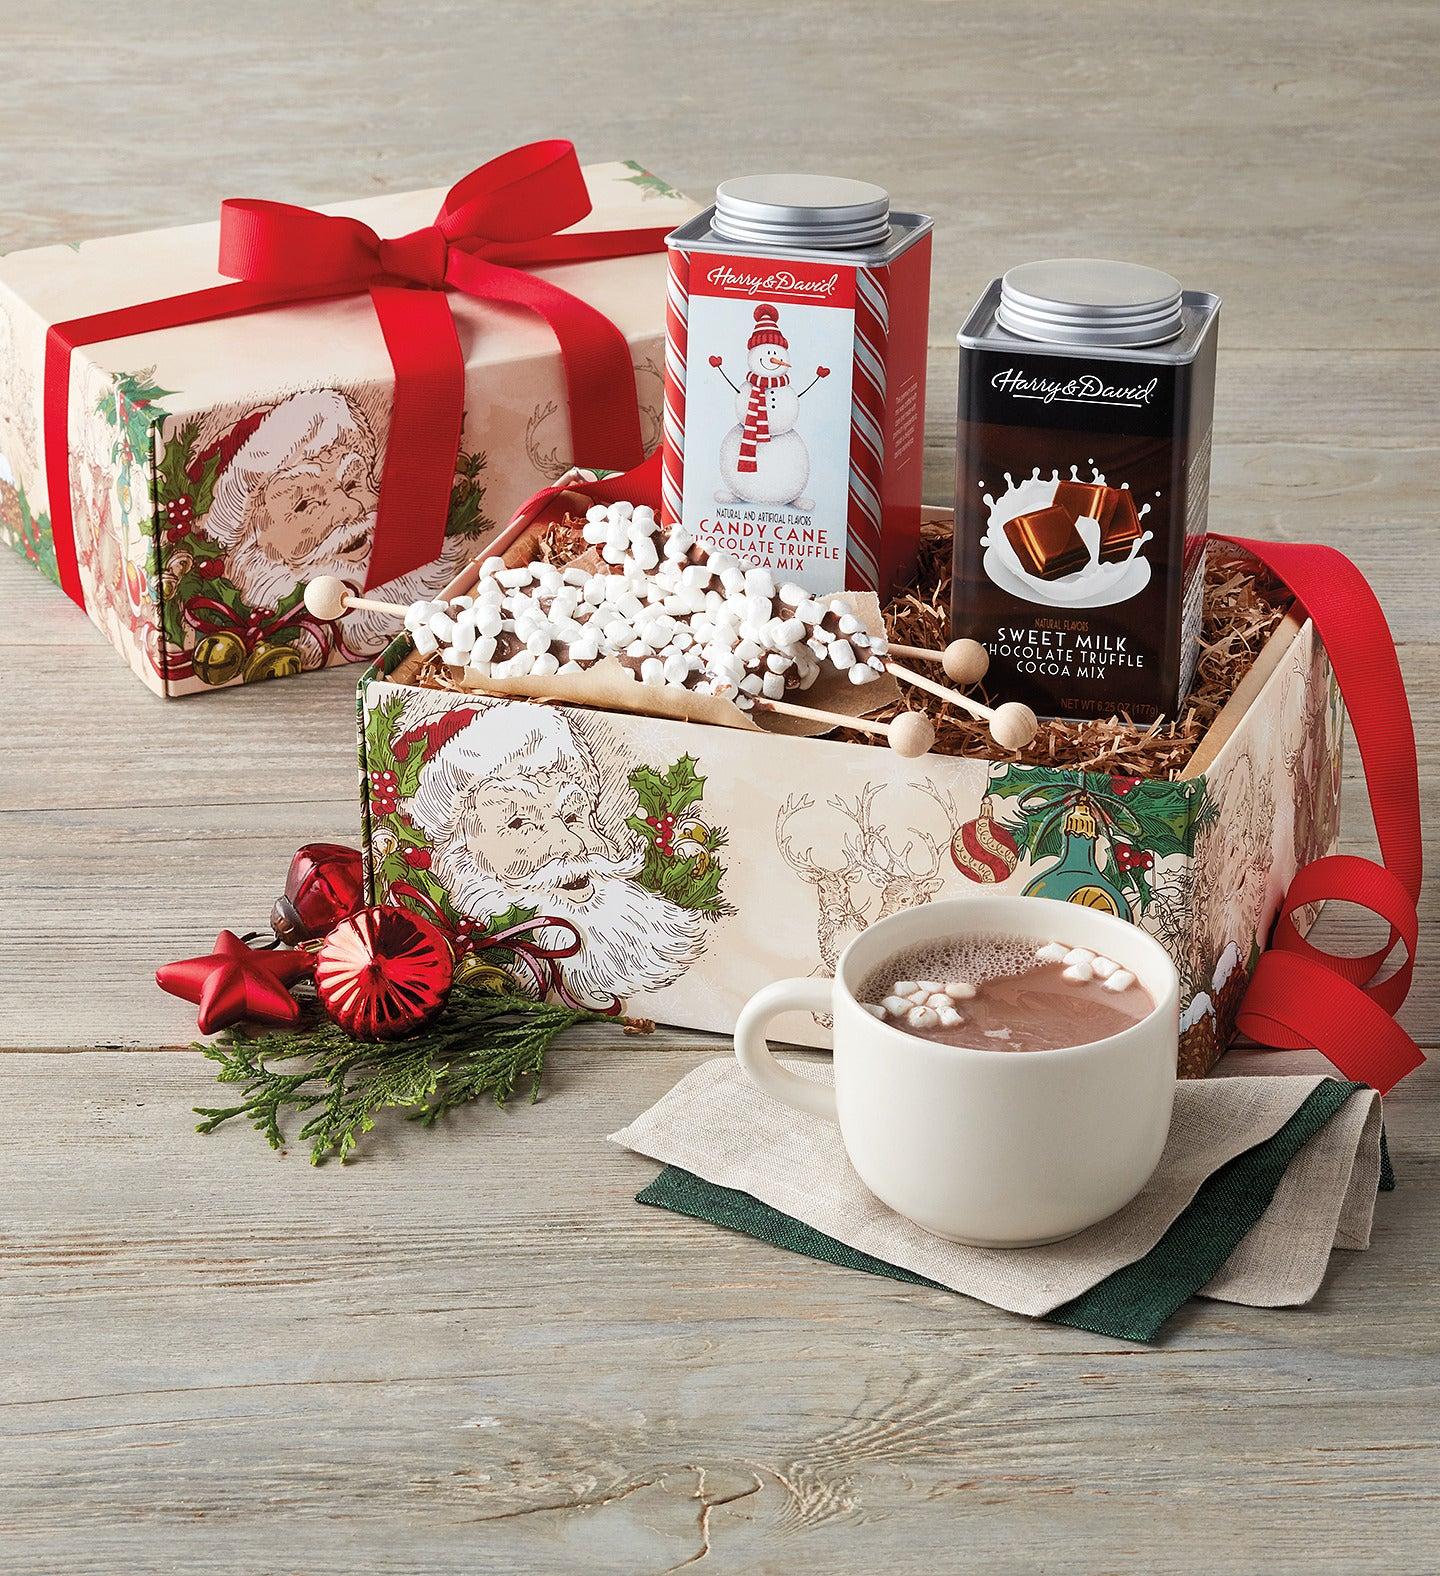 Holiday Hot Chocolate Duo Gift Box